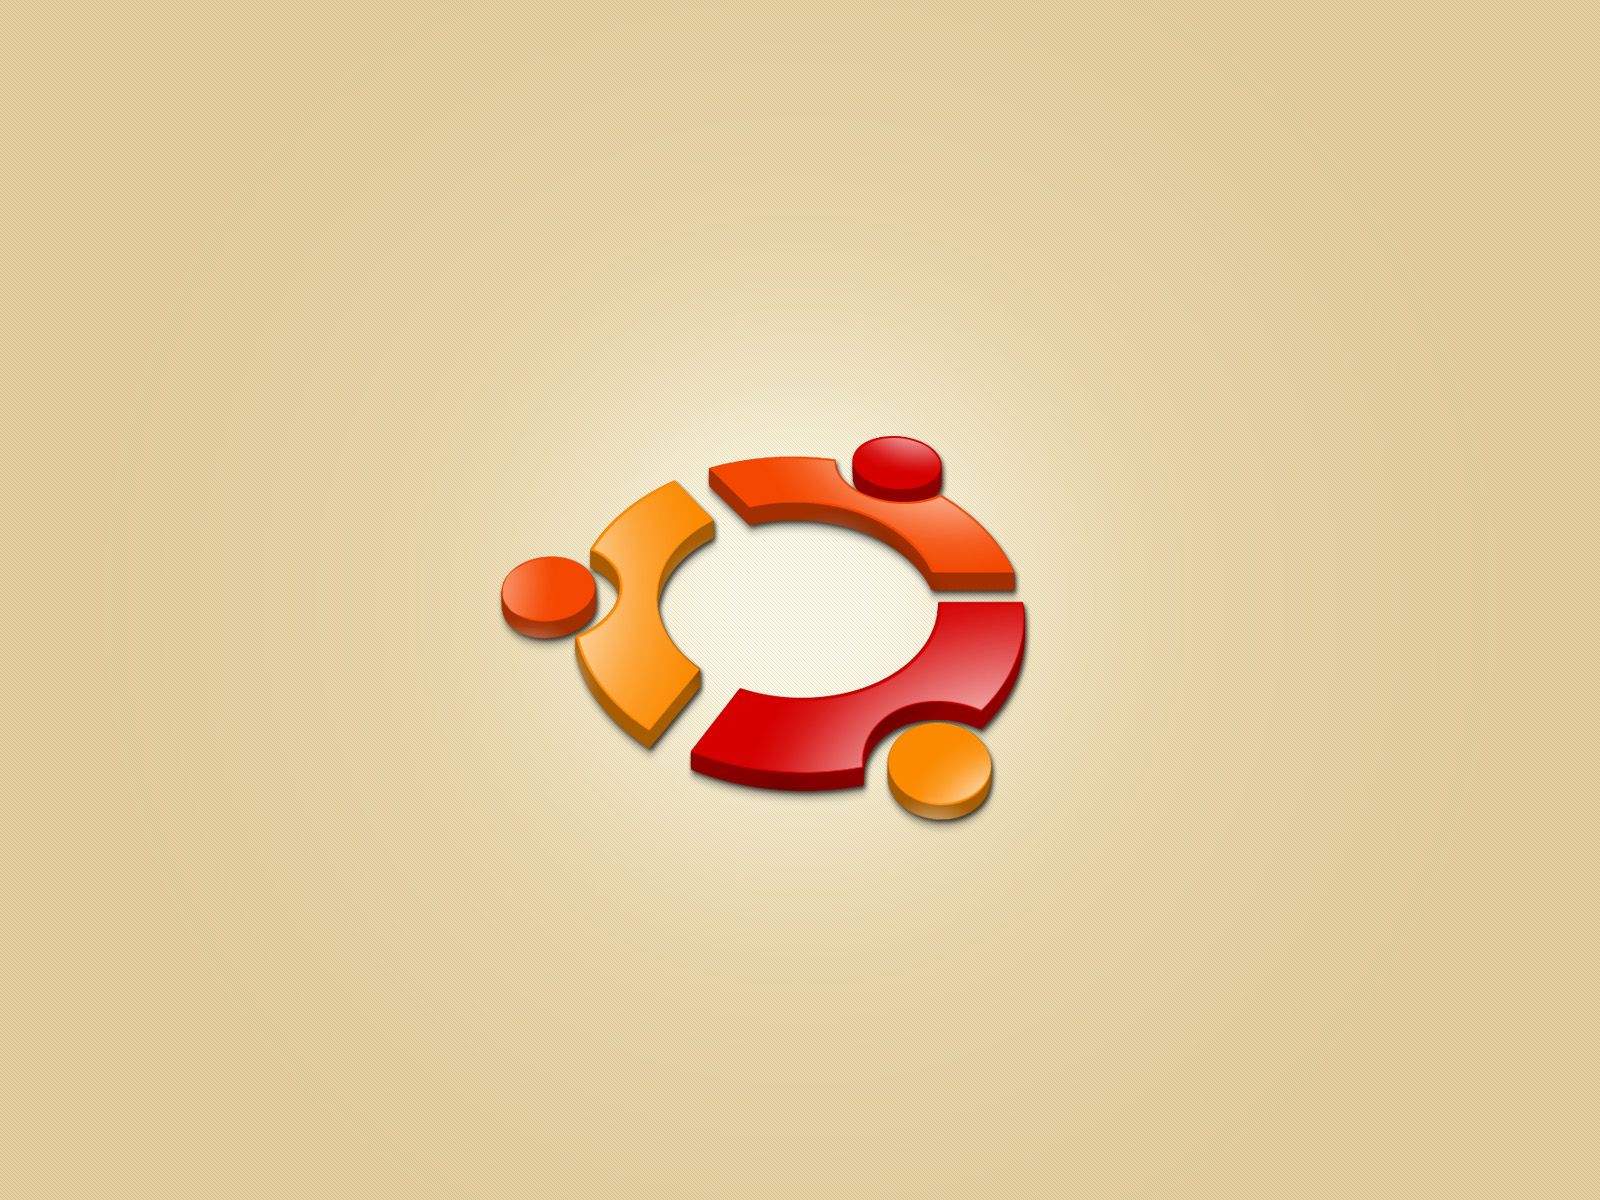 La prochaine Ubuntu proposera une barre de menus unique